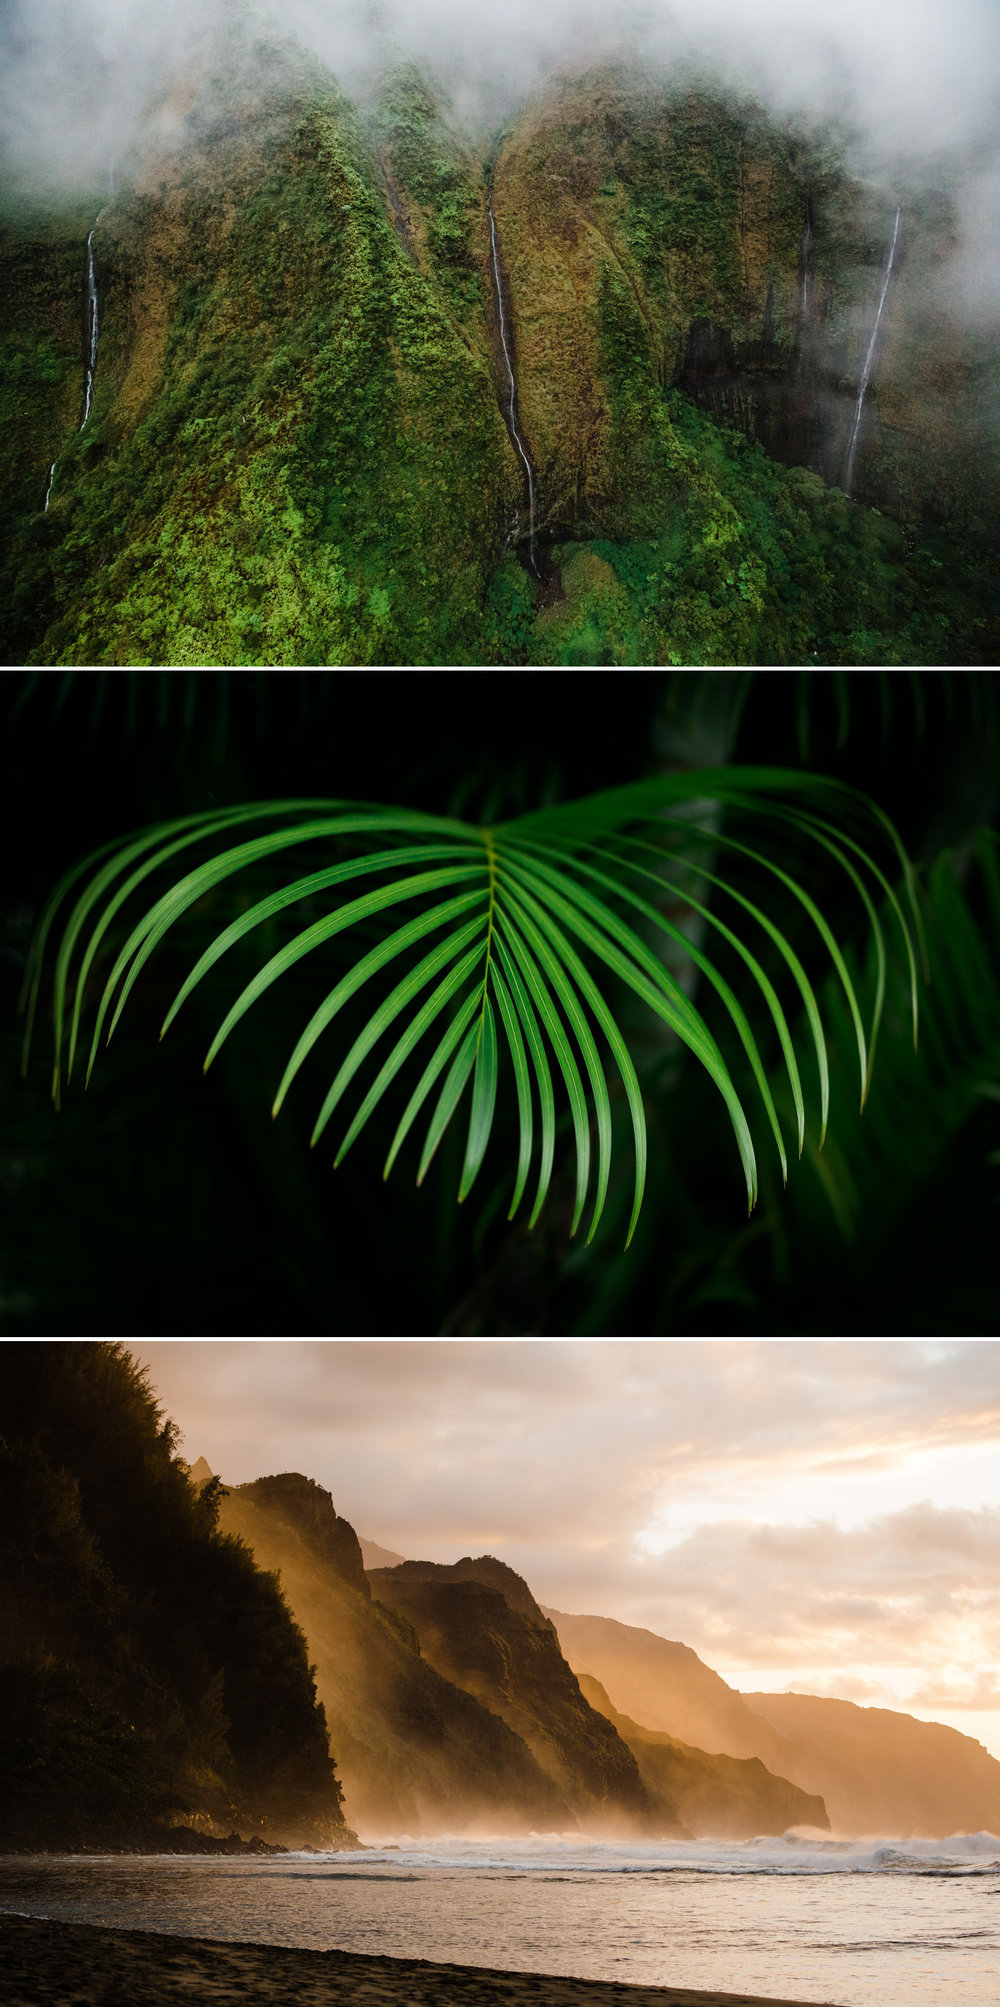 cameron-zegers-photography-travel-hawaii-kauai-13.jpg